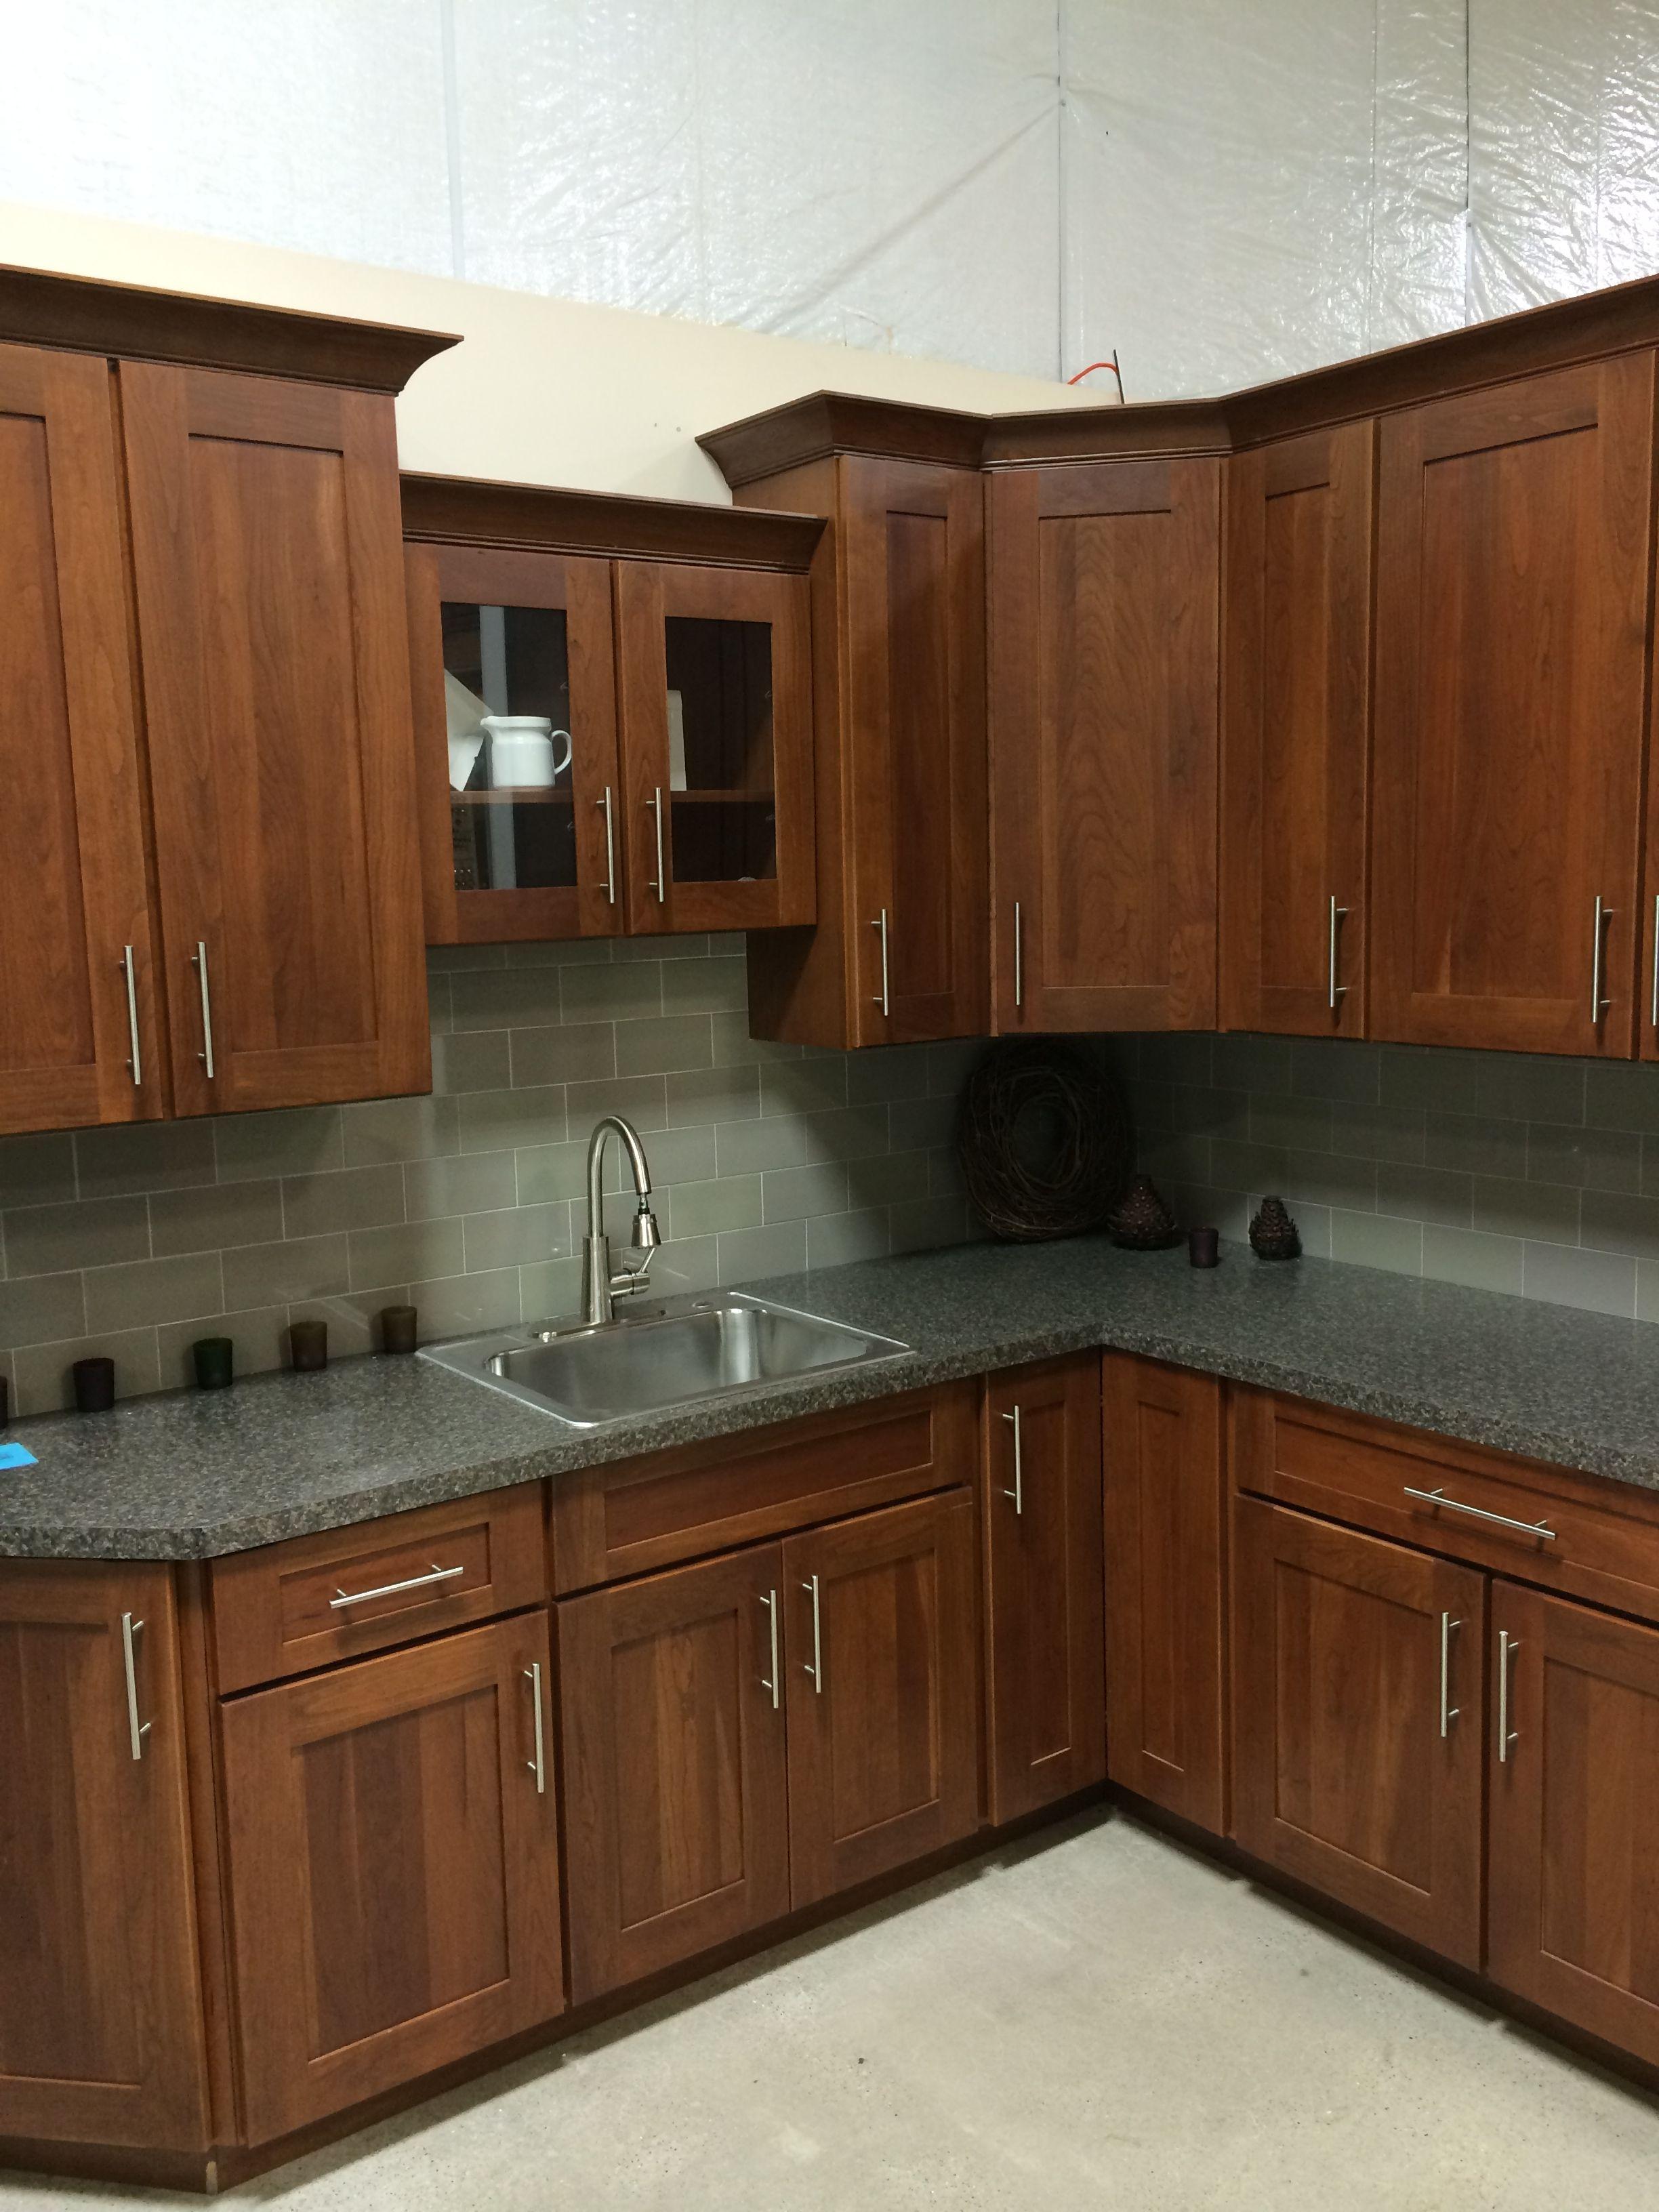 Kitchen Remodel Under 5000 5000 Kitchen Remodel Affordable Kitchens Baths And Appliances